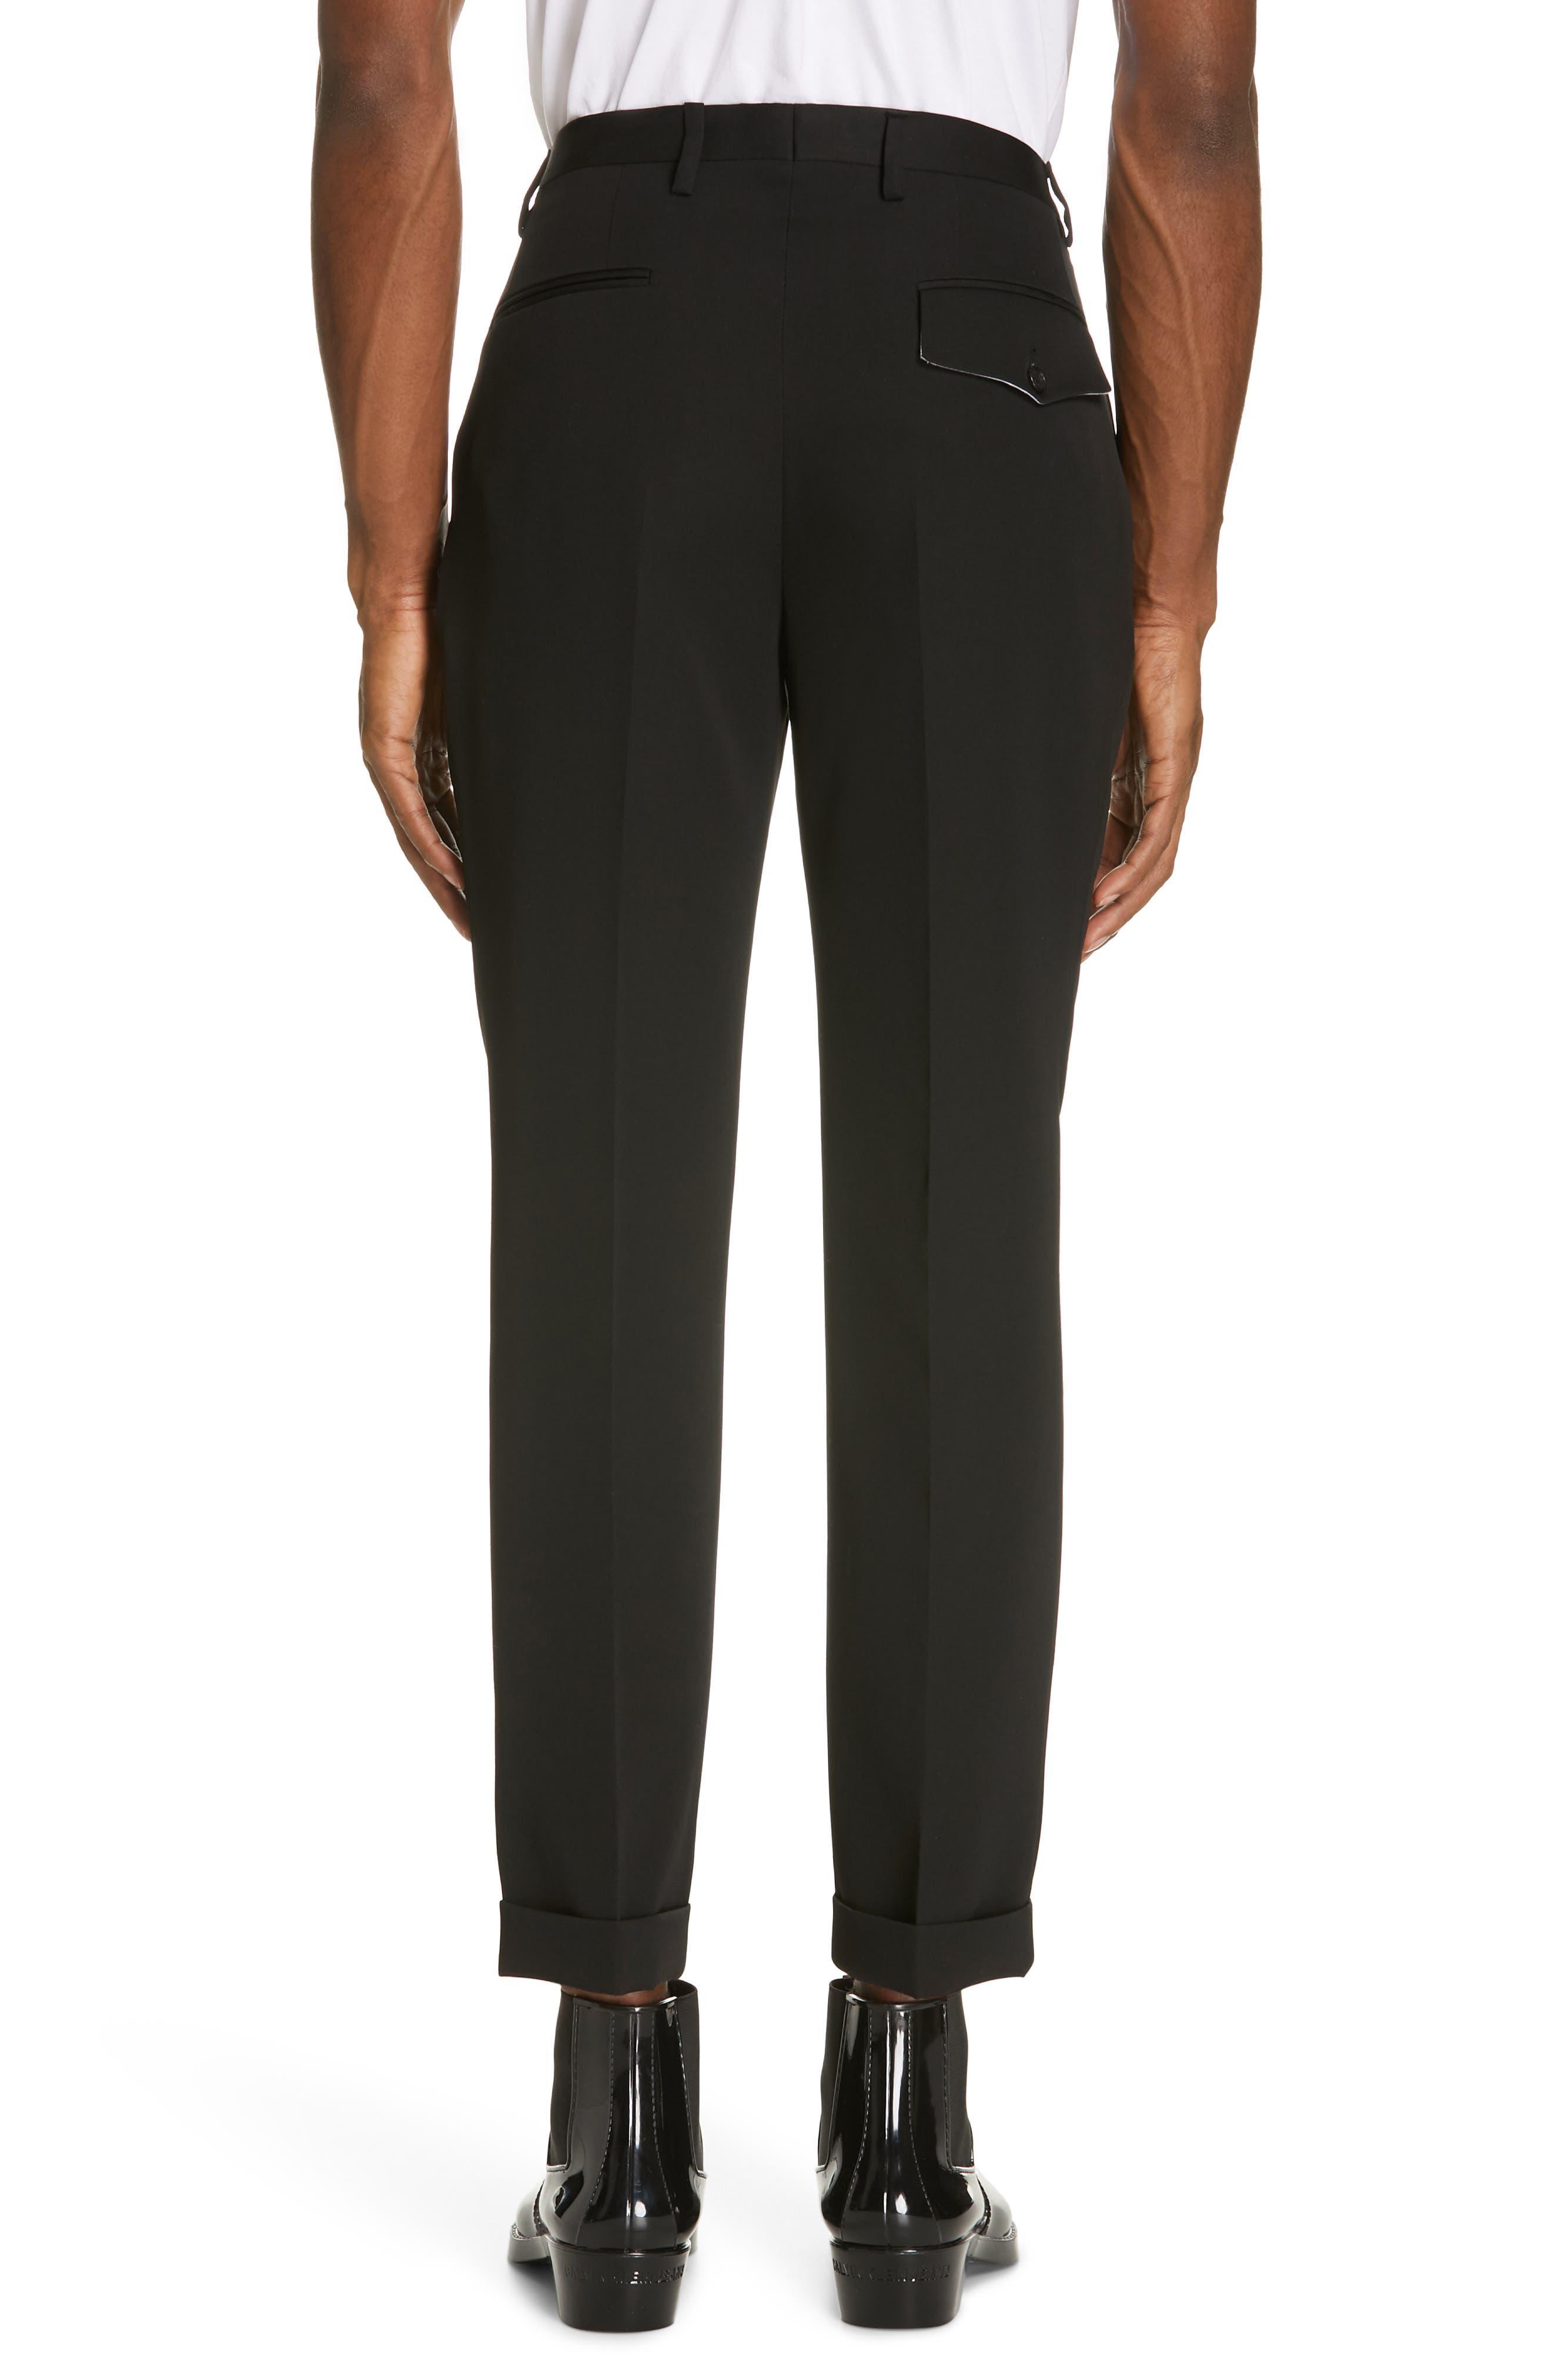 CALVIN KLEIN 205W39NYC, Pleated Gabardine Wool Trousers, Alternate thumbnail 2, color, BLACK